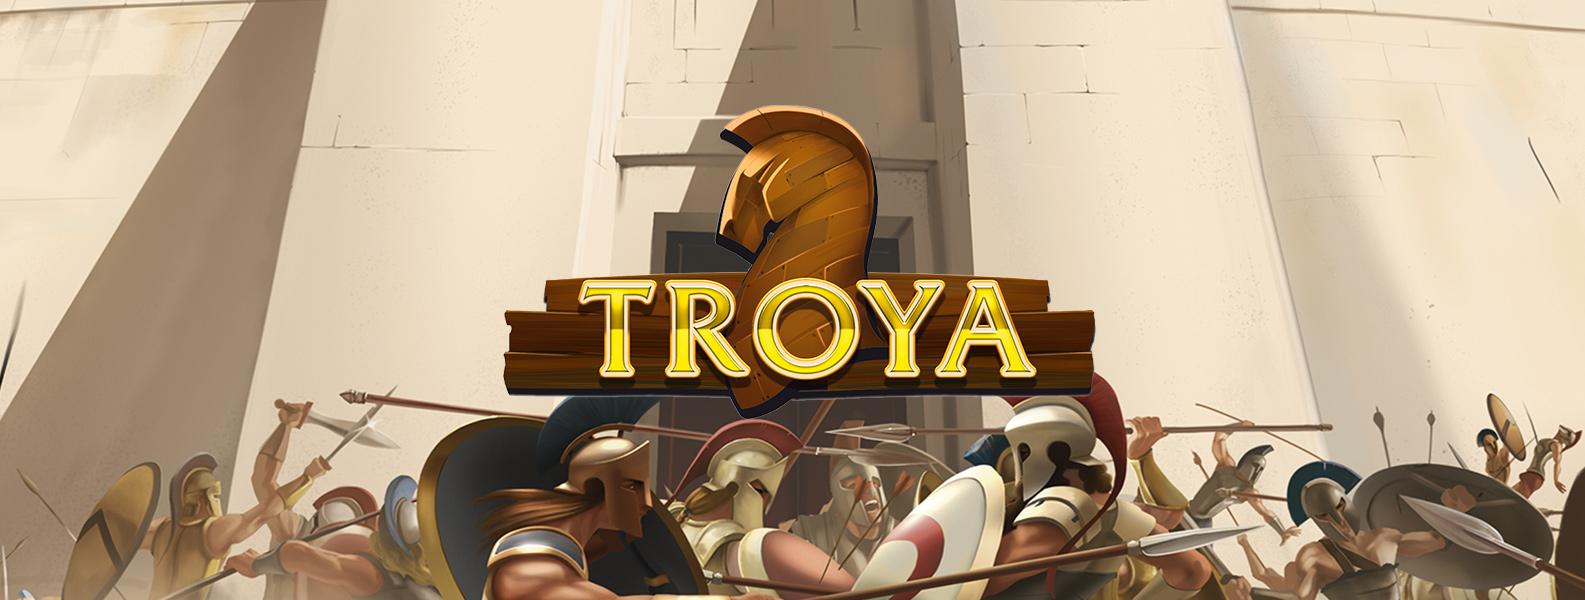 cabecera_Troya